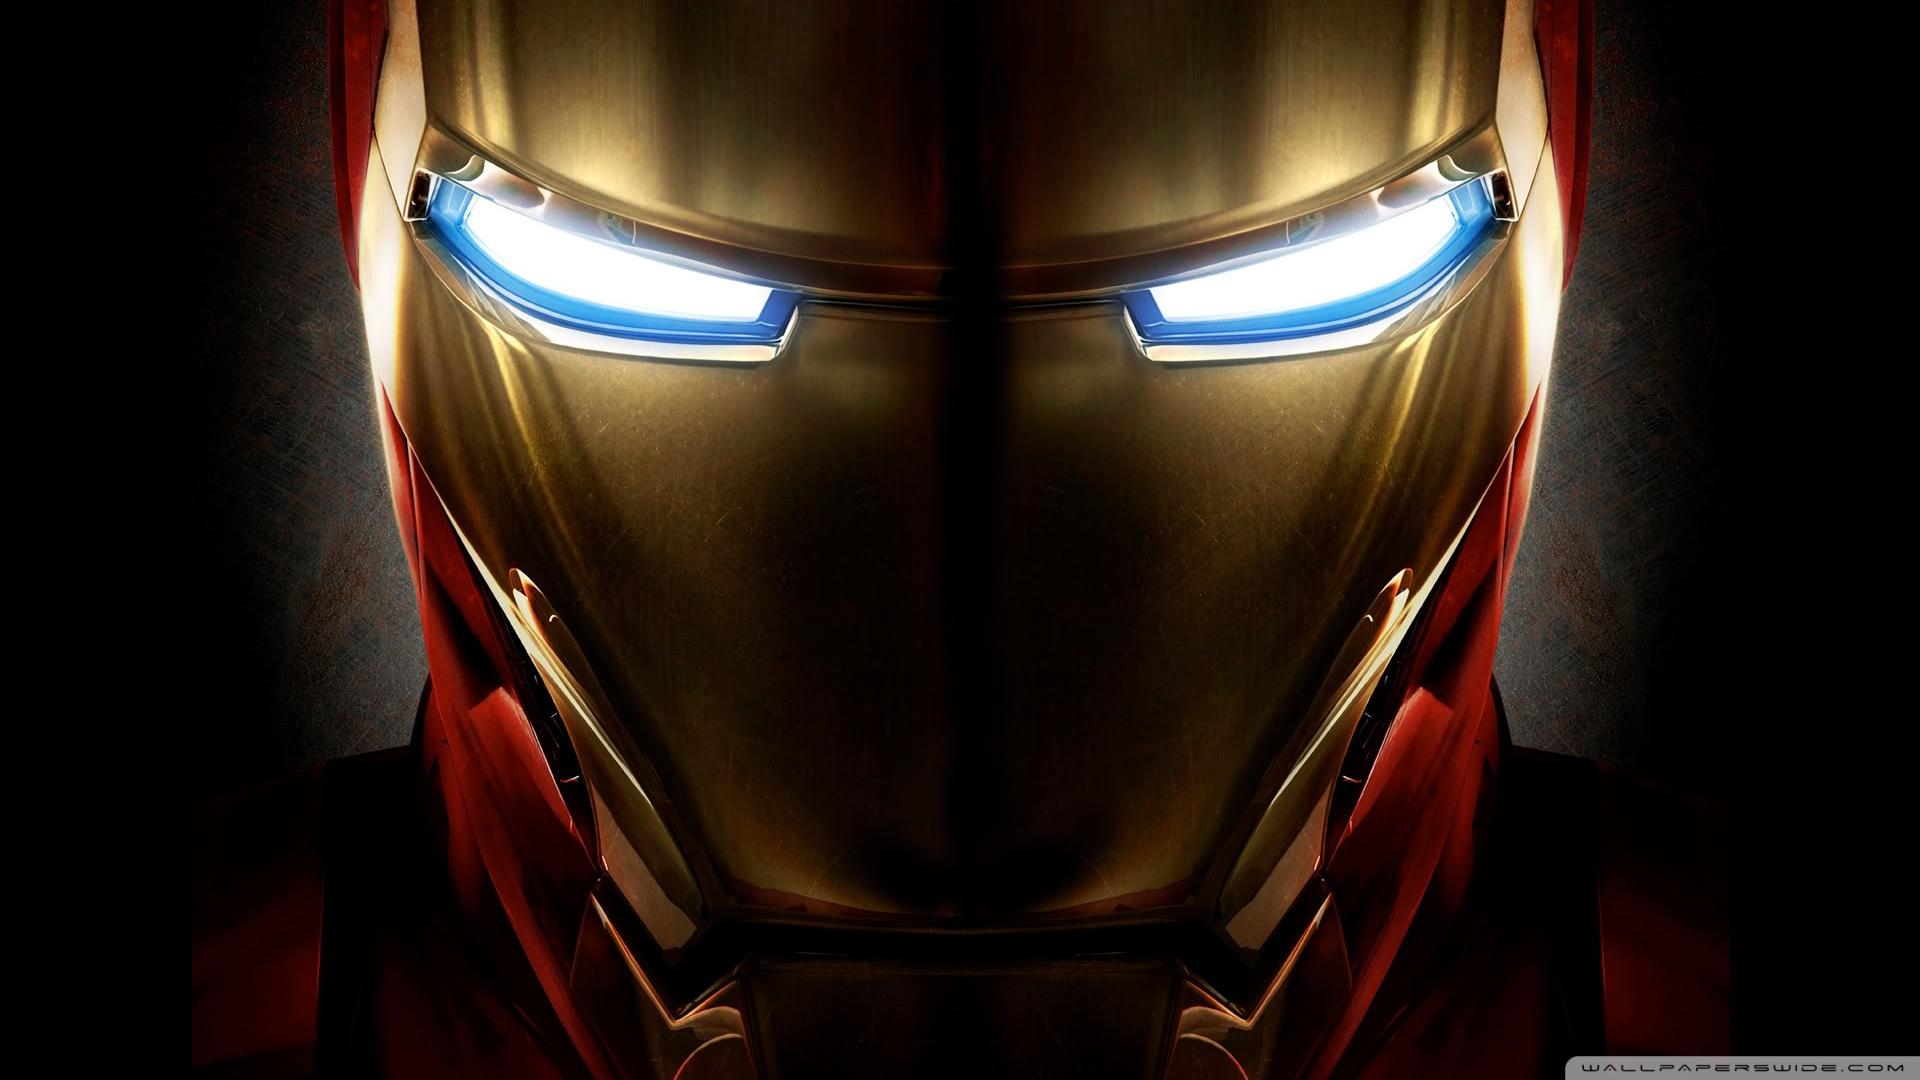 Iron Man Helmet HD Wallpaper Desktop Movie 1920x1080